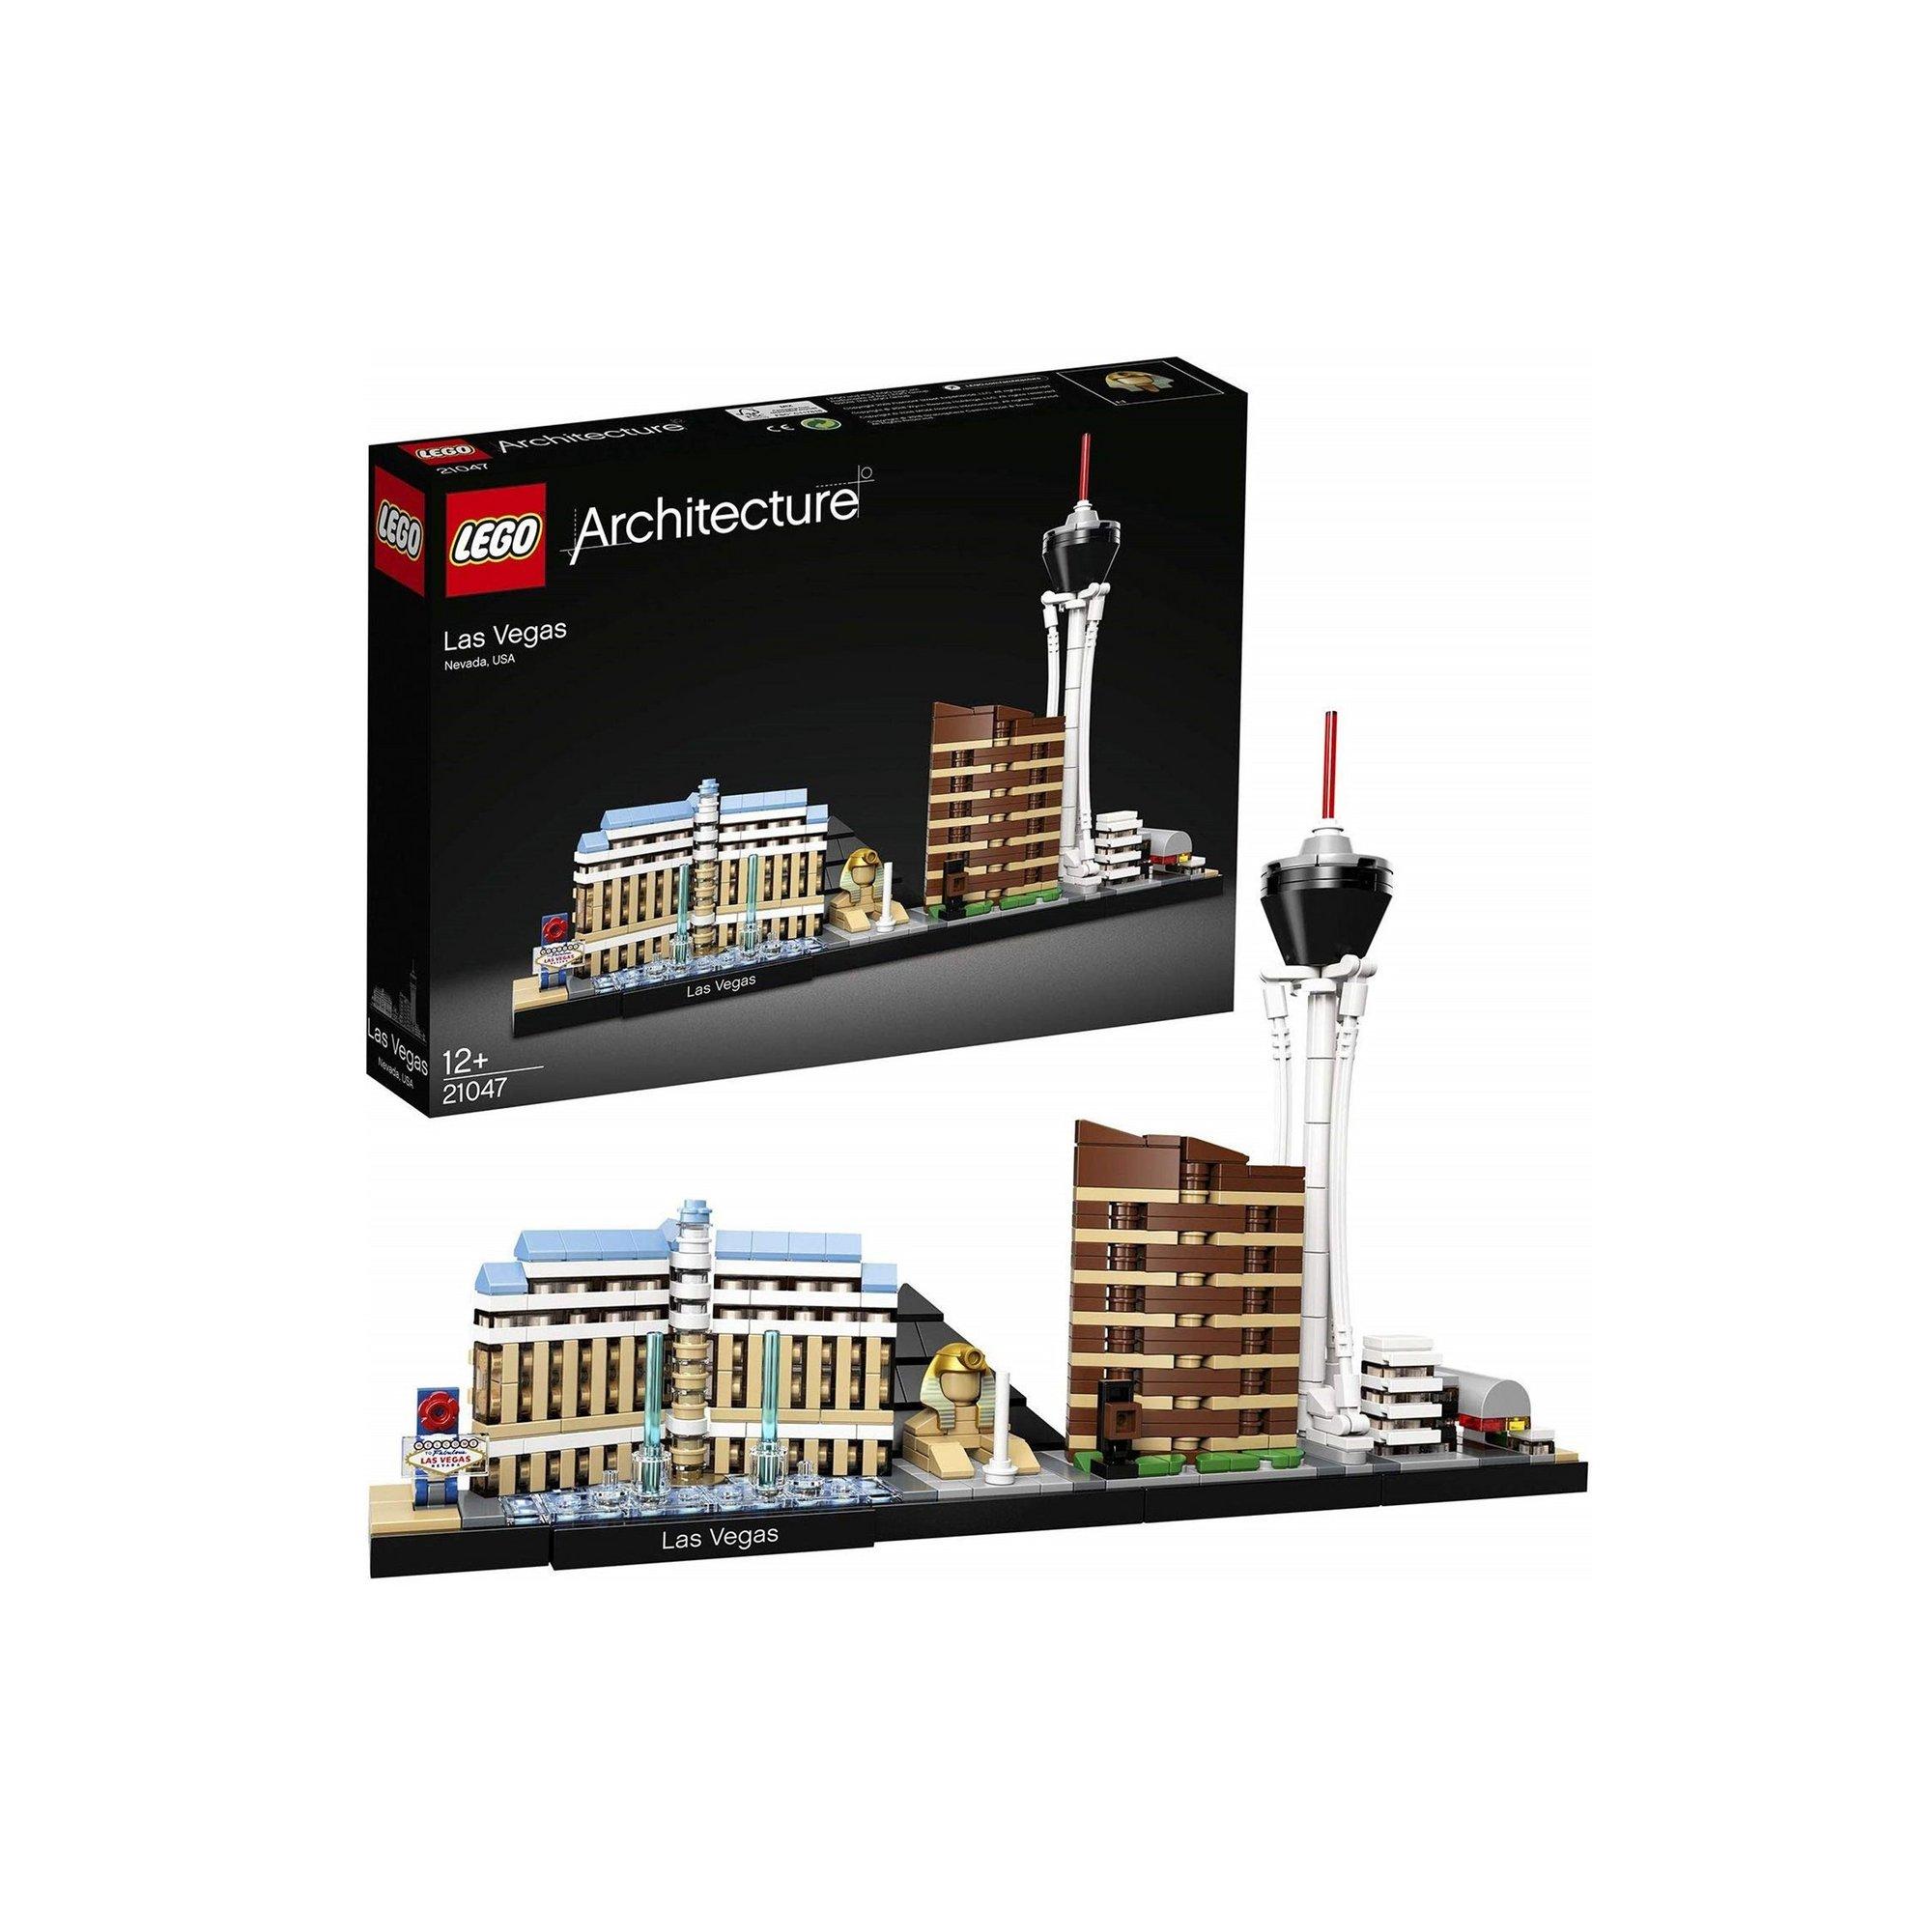 Image of LEGO Architecture Las Vegas